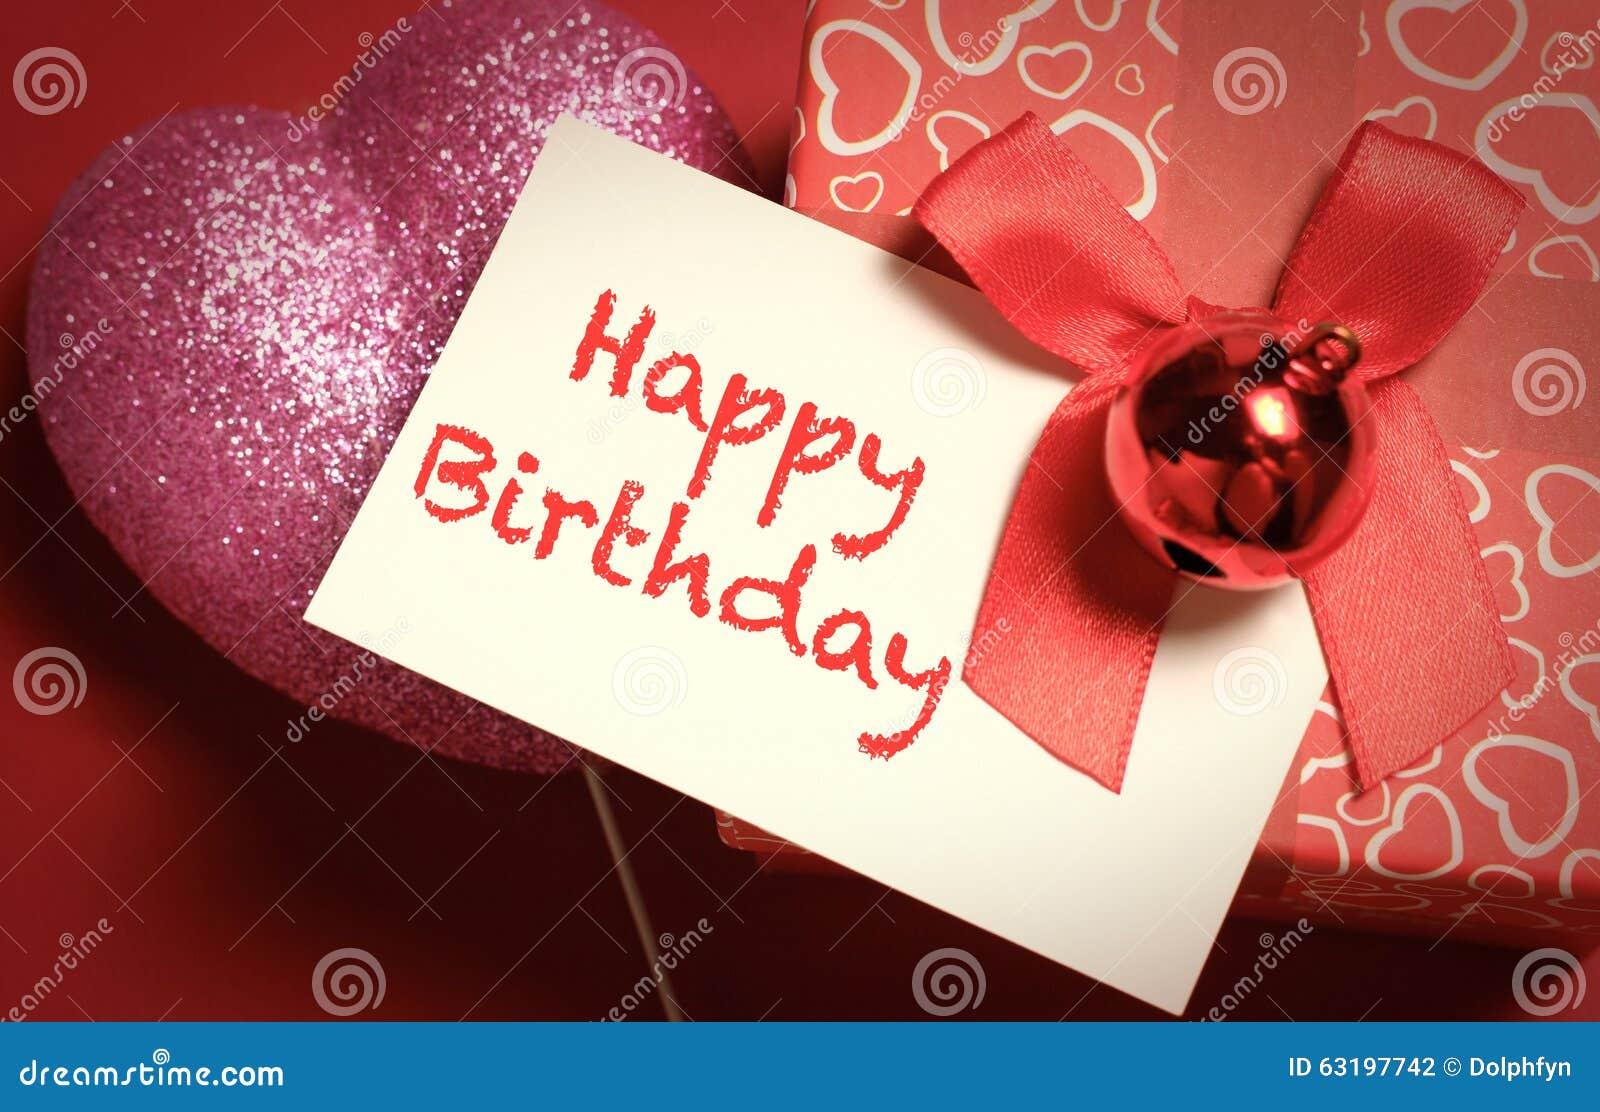 Happy birthday stock photo image of present message 63197742 happy birthday kristyandbryce Gallery